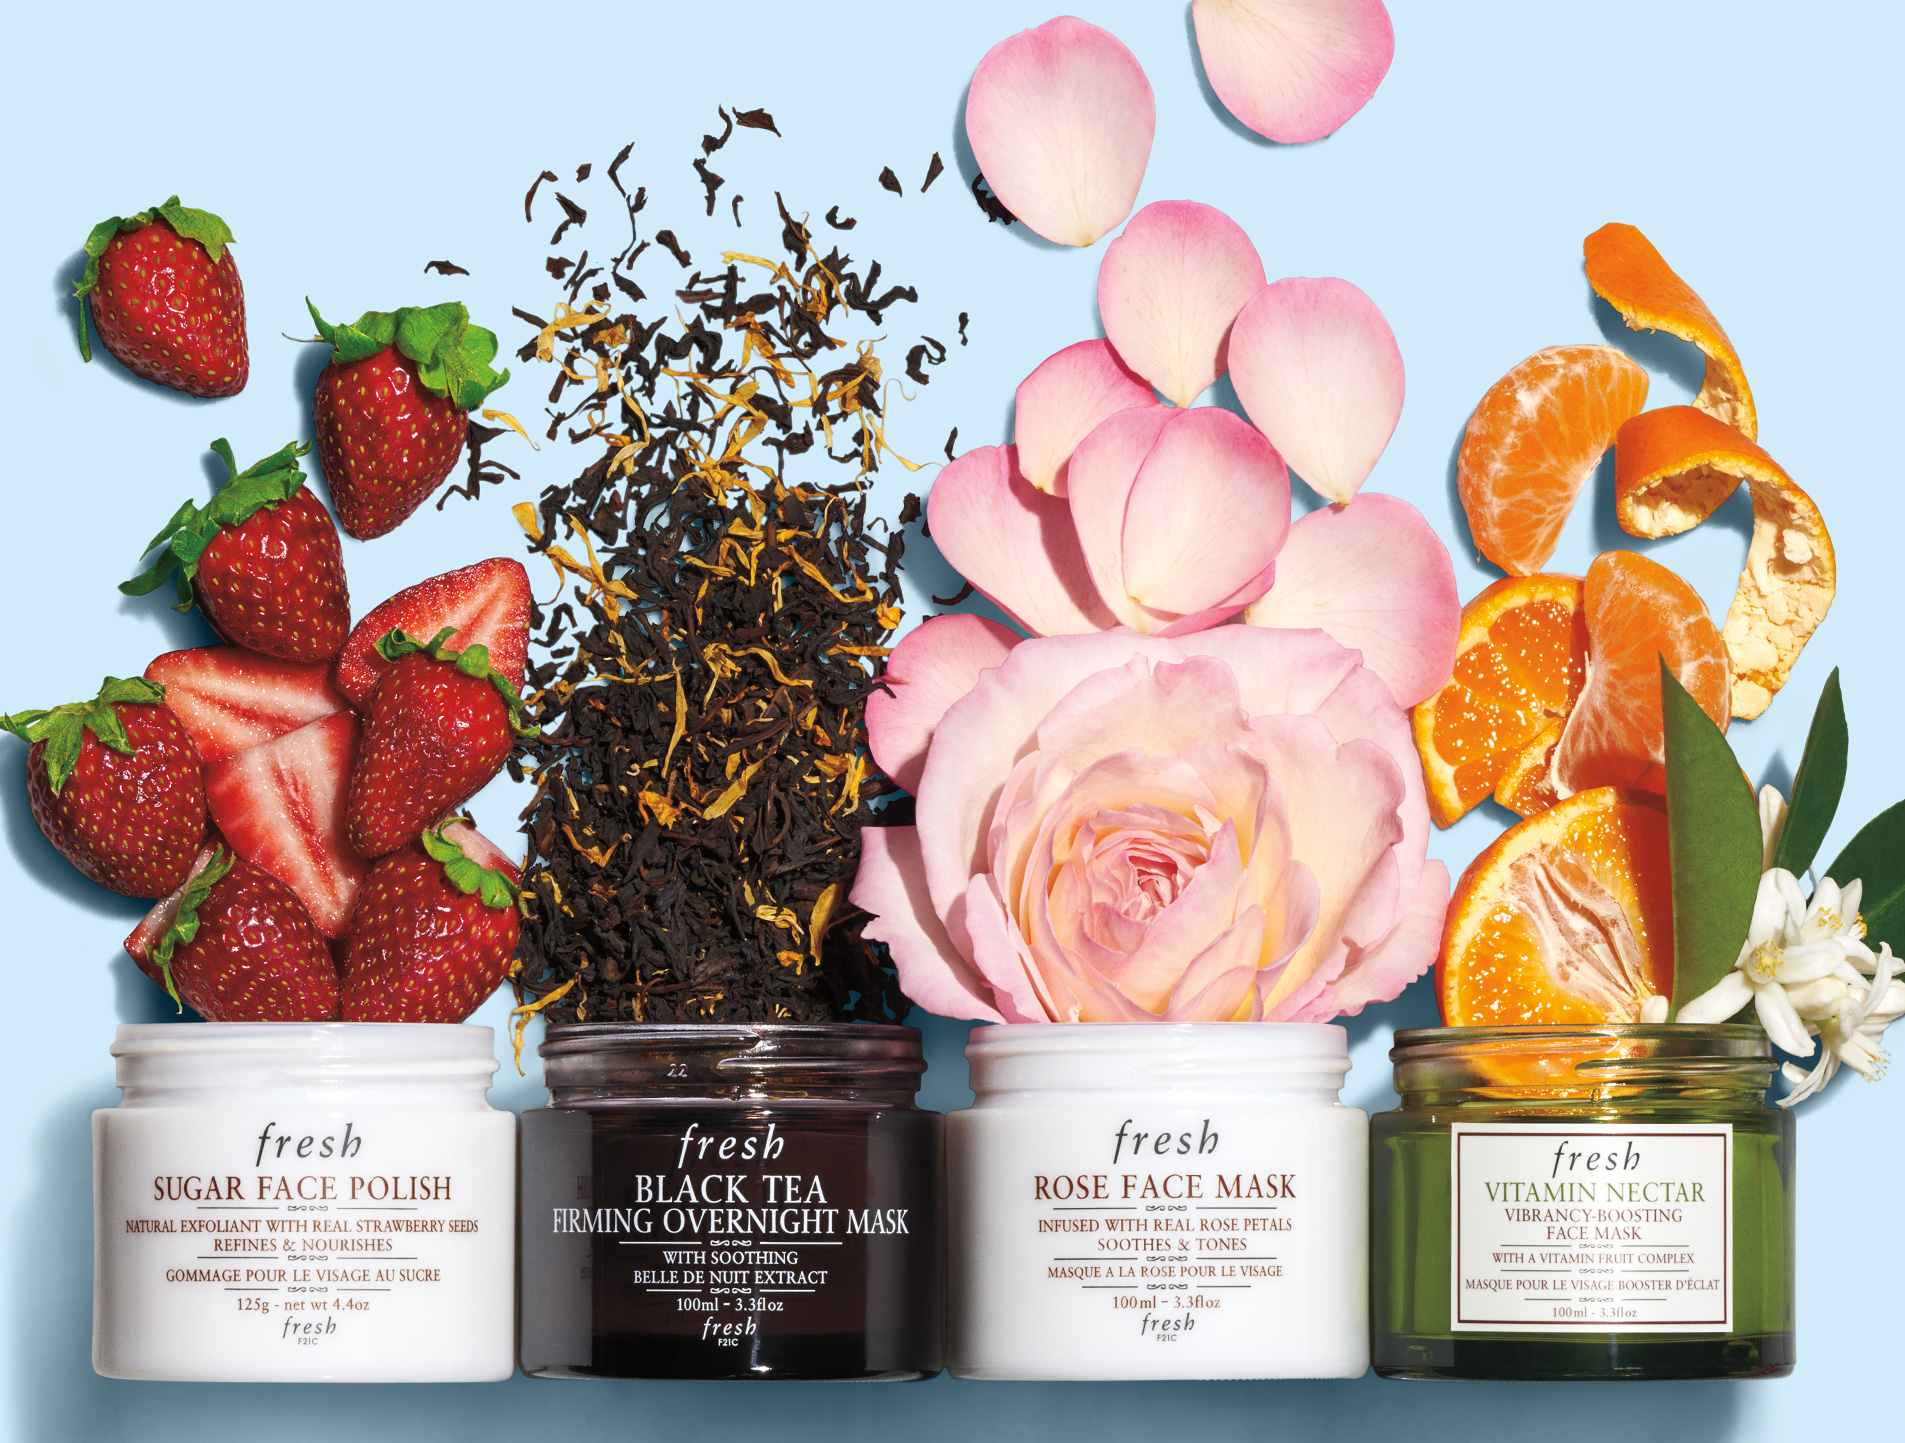 Fresh - Skin care, Perfumes and Fragrances, Makeup